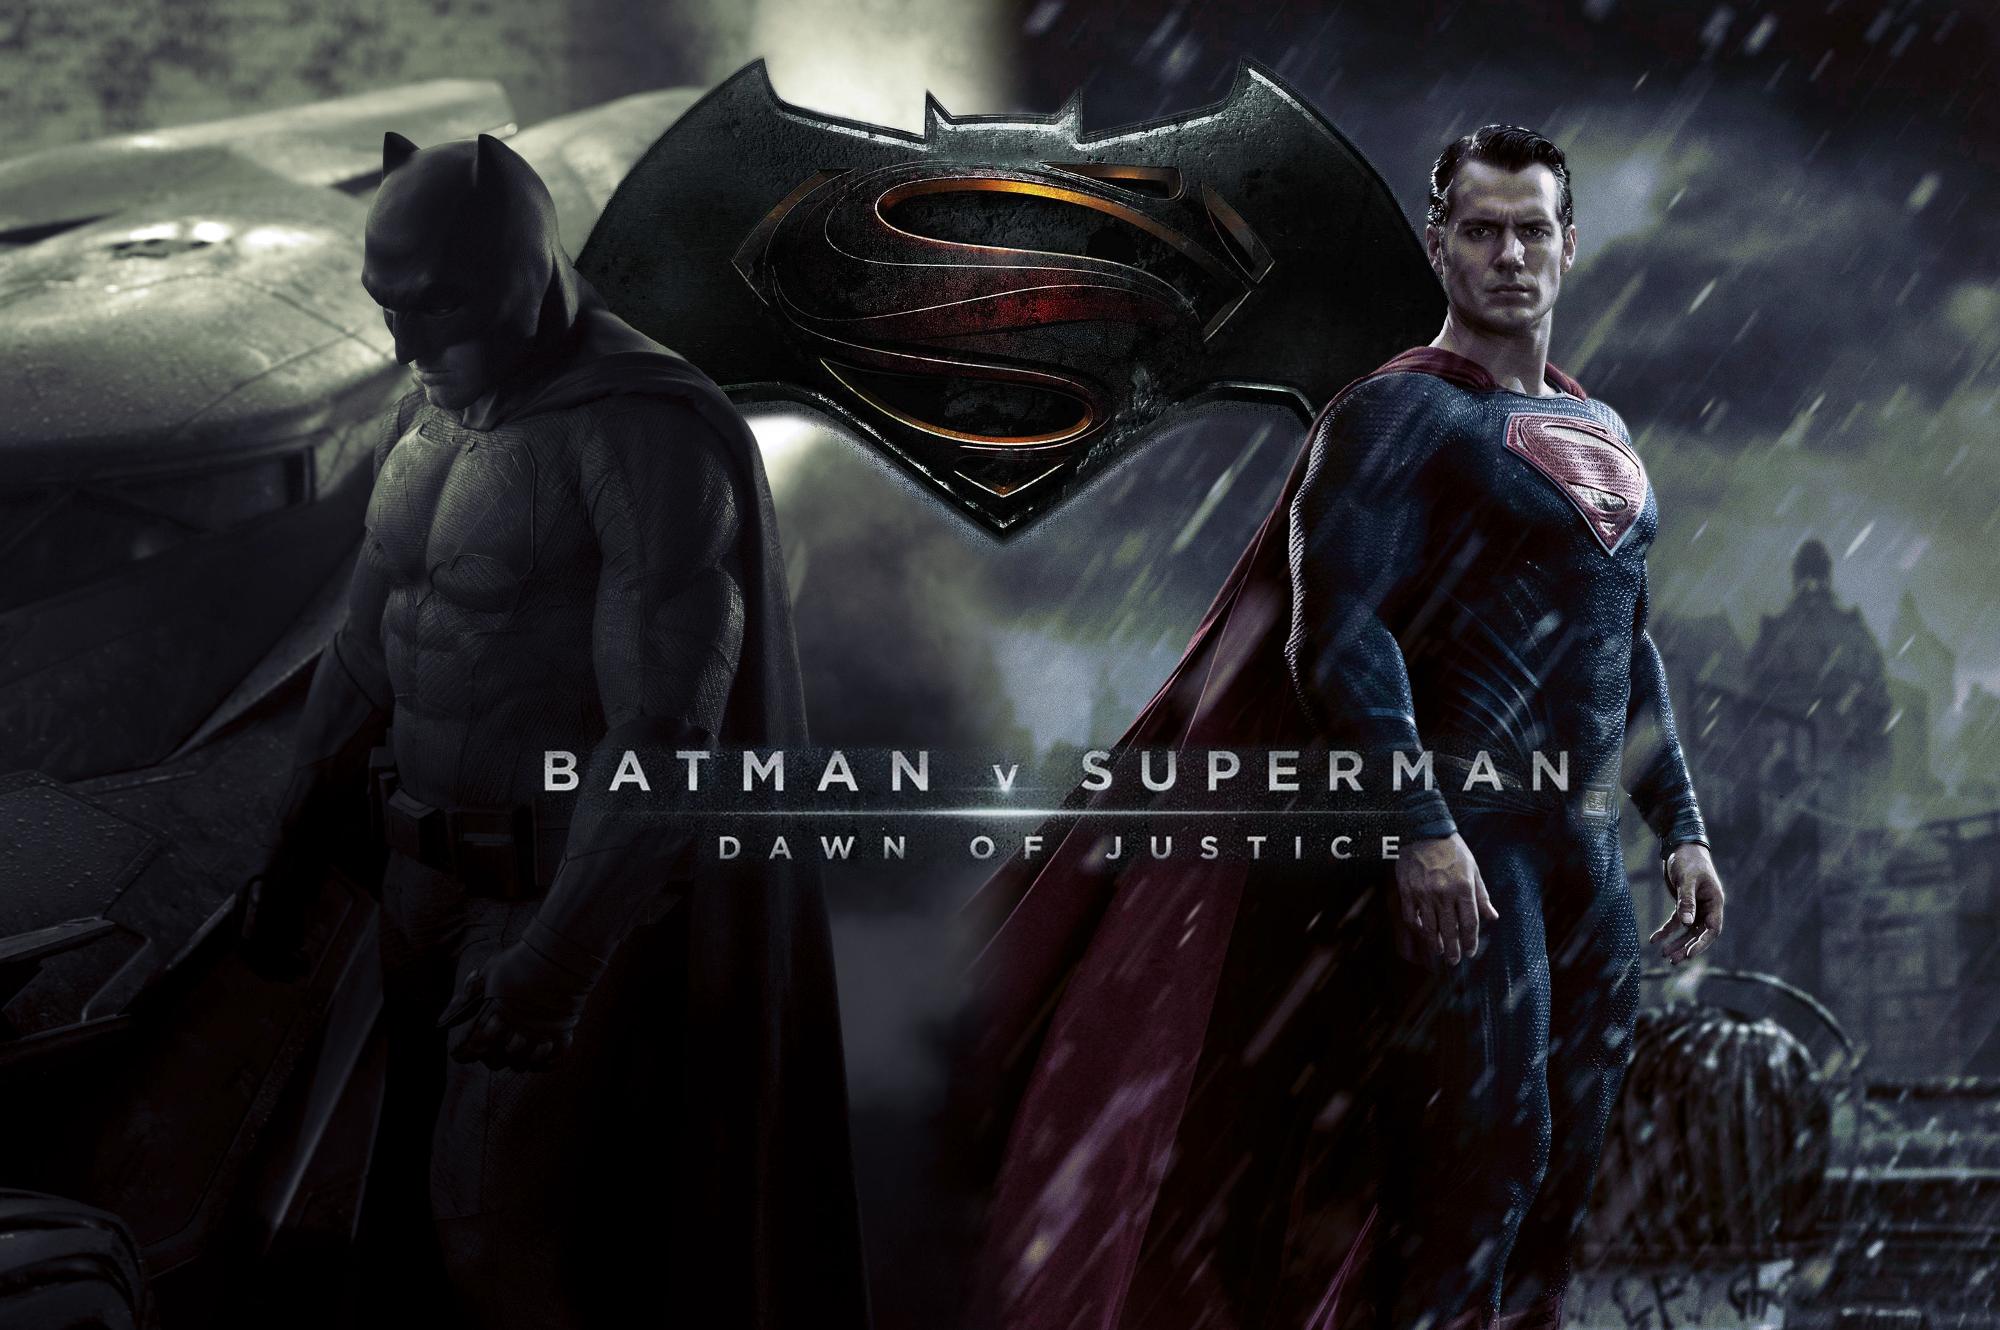 batman vs superman Should Warner Bros. Have Waited Before Confirming Zack Snyder for Justice League?